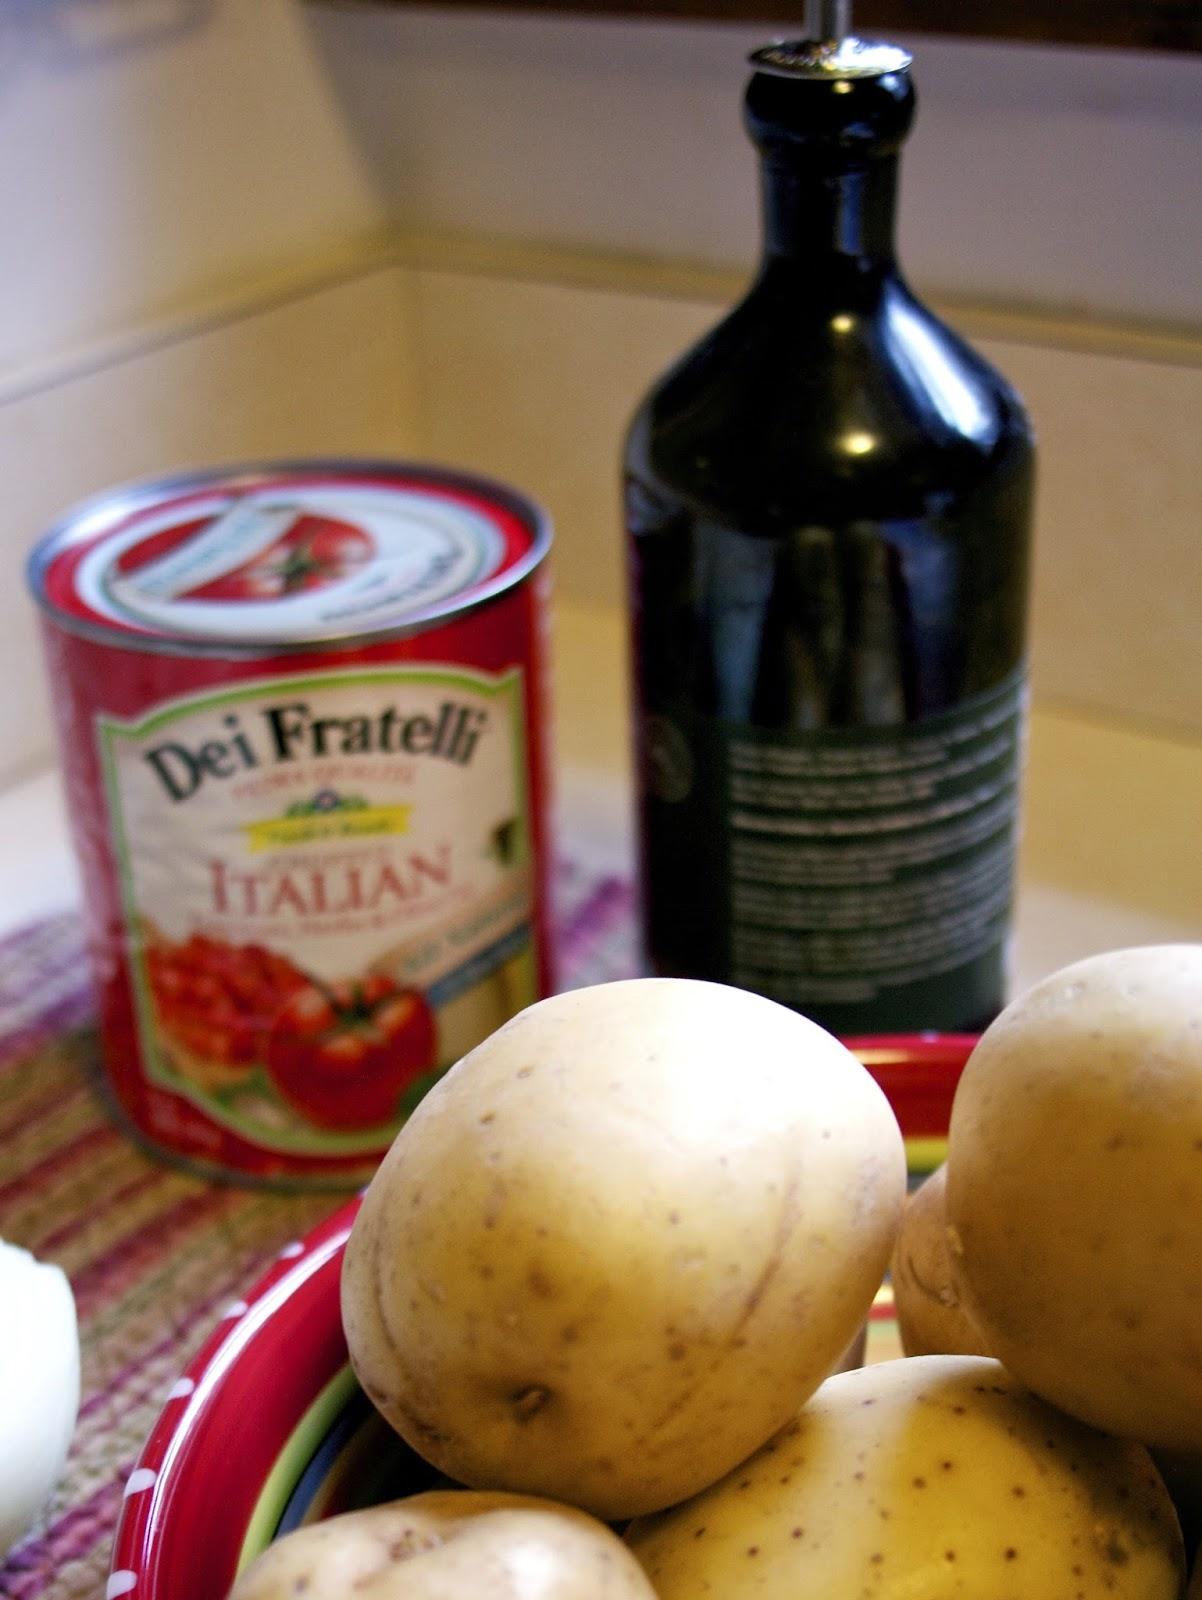 Dei Fratelli tomato: simplelivingeating.com